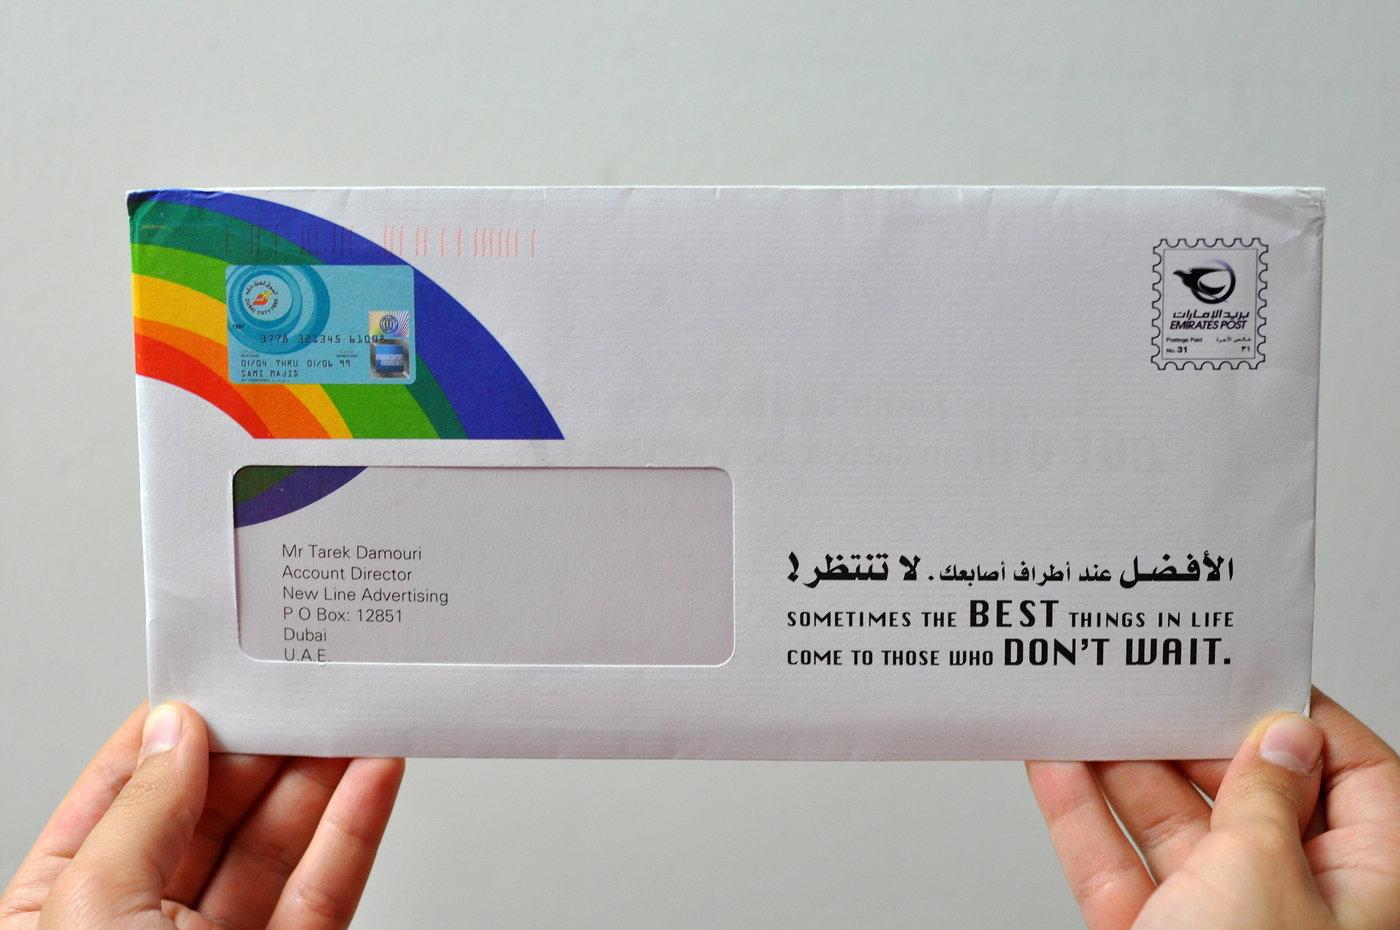 American express credit card by tarek damouri at coroflot reheart Choice Image